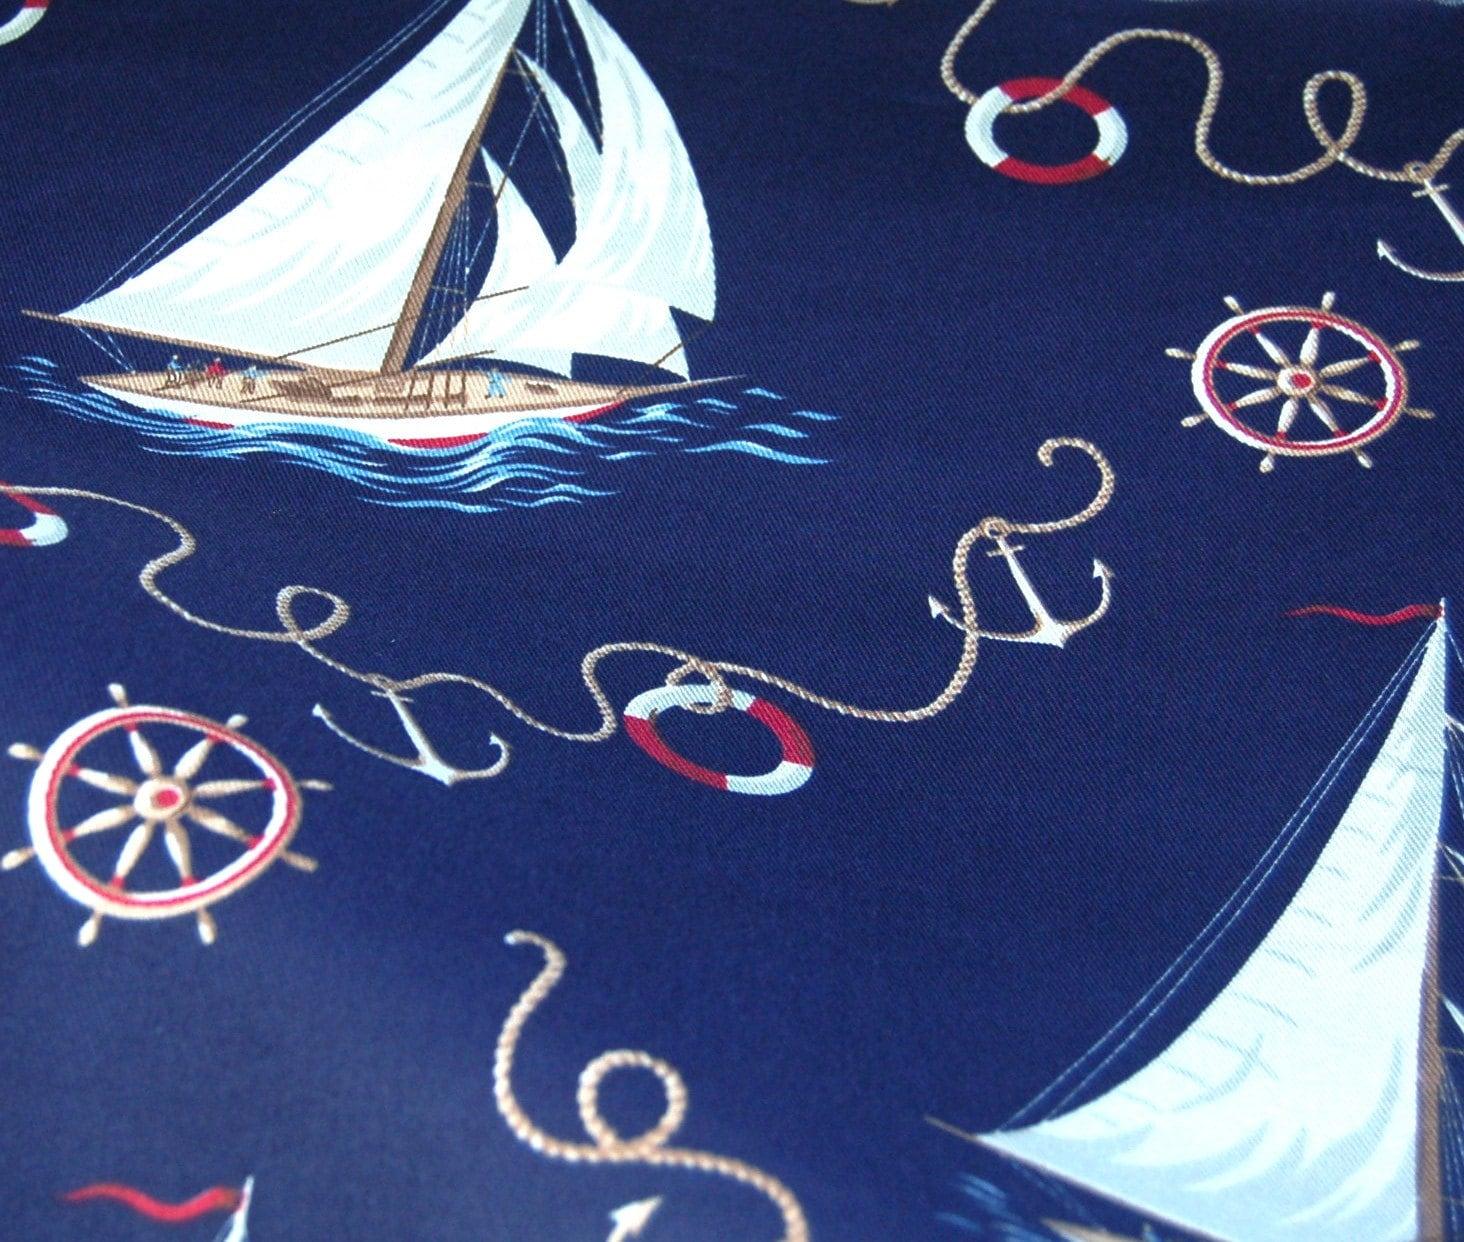 Ralph Lauren Navy Sailboat Nautical Upholstery Fabric Over 1